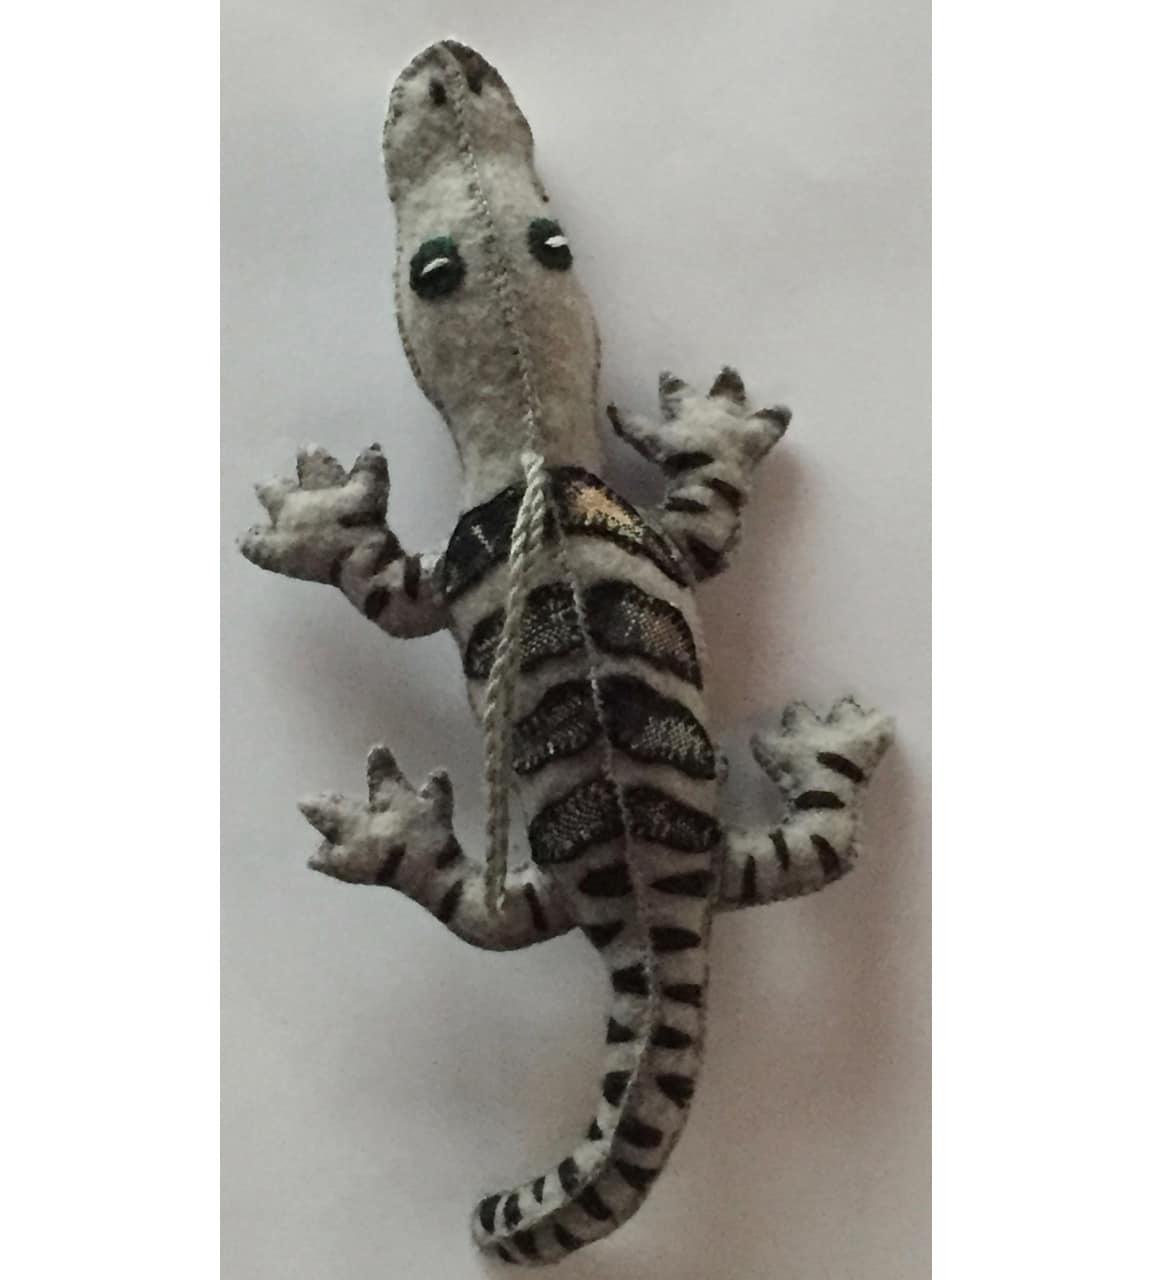 Alligator Ornament - Felt and Repurposed Traditional Fabric